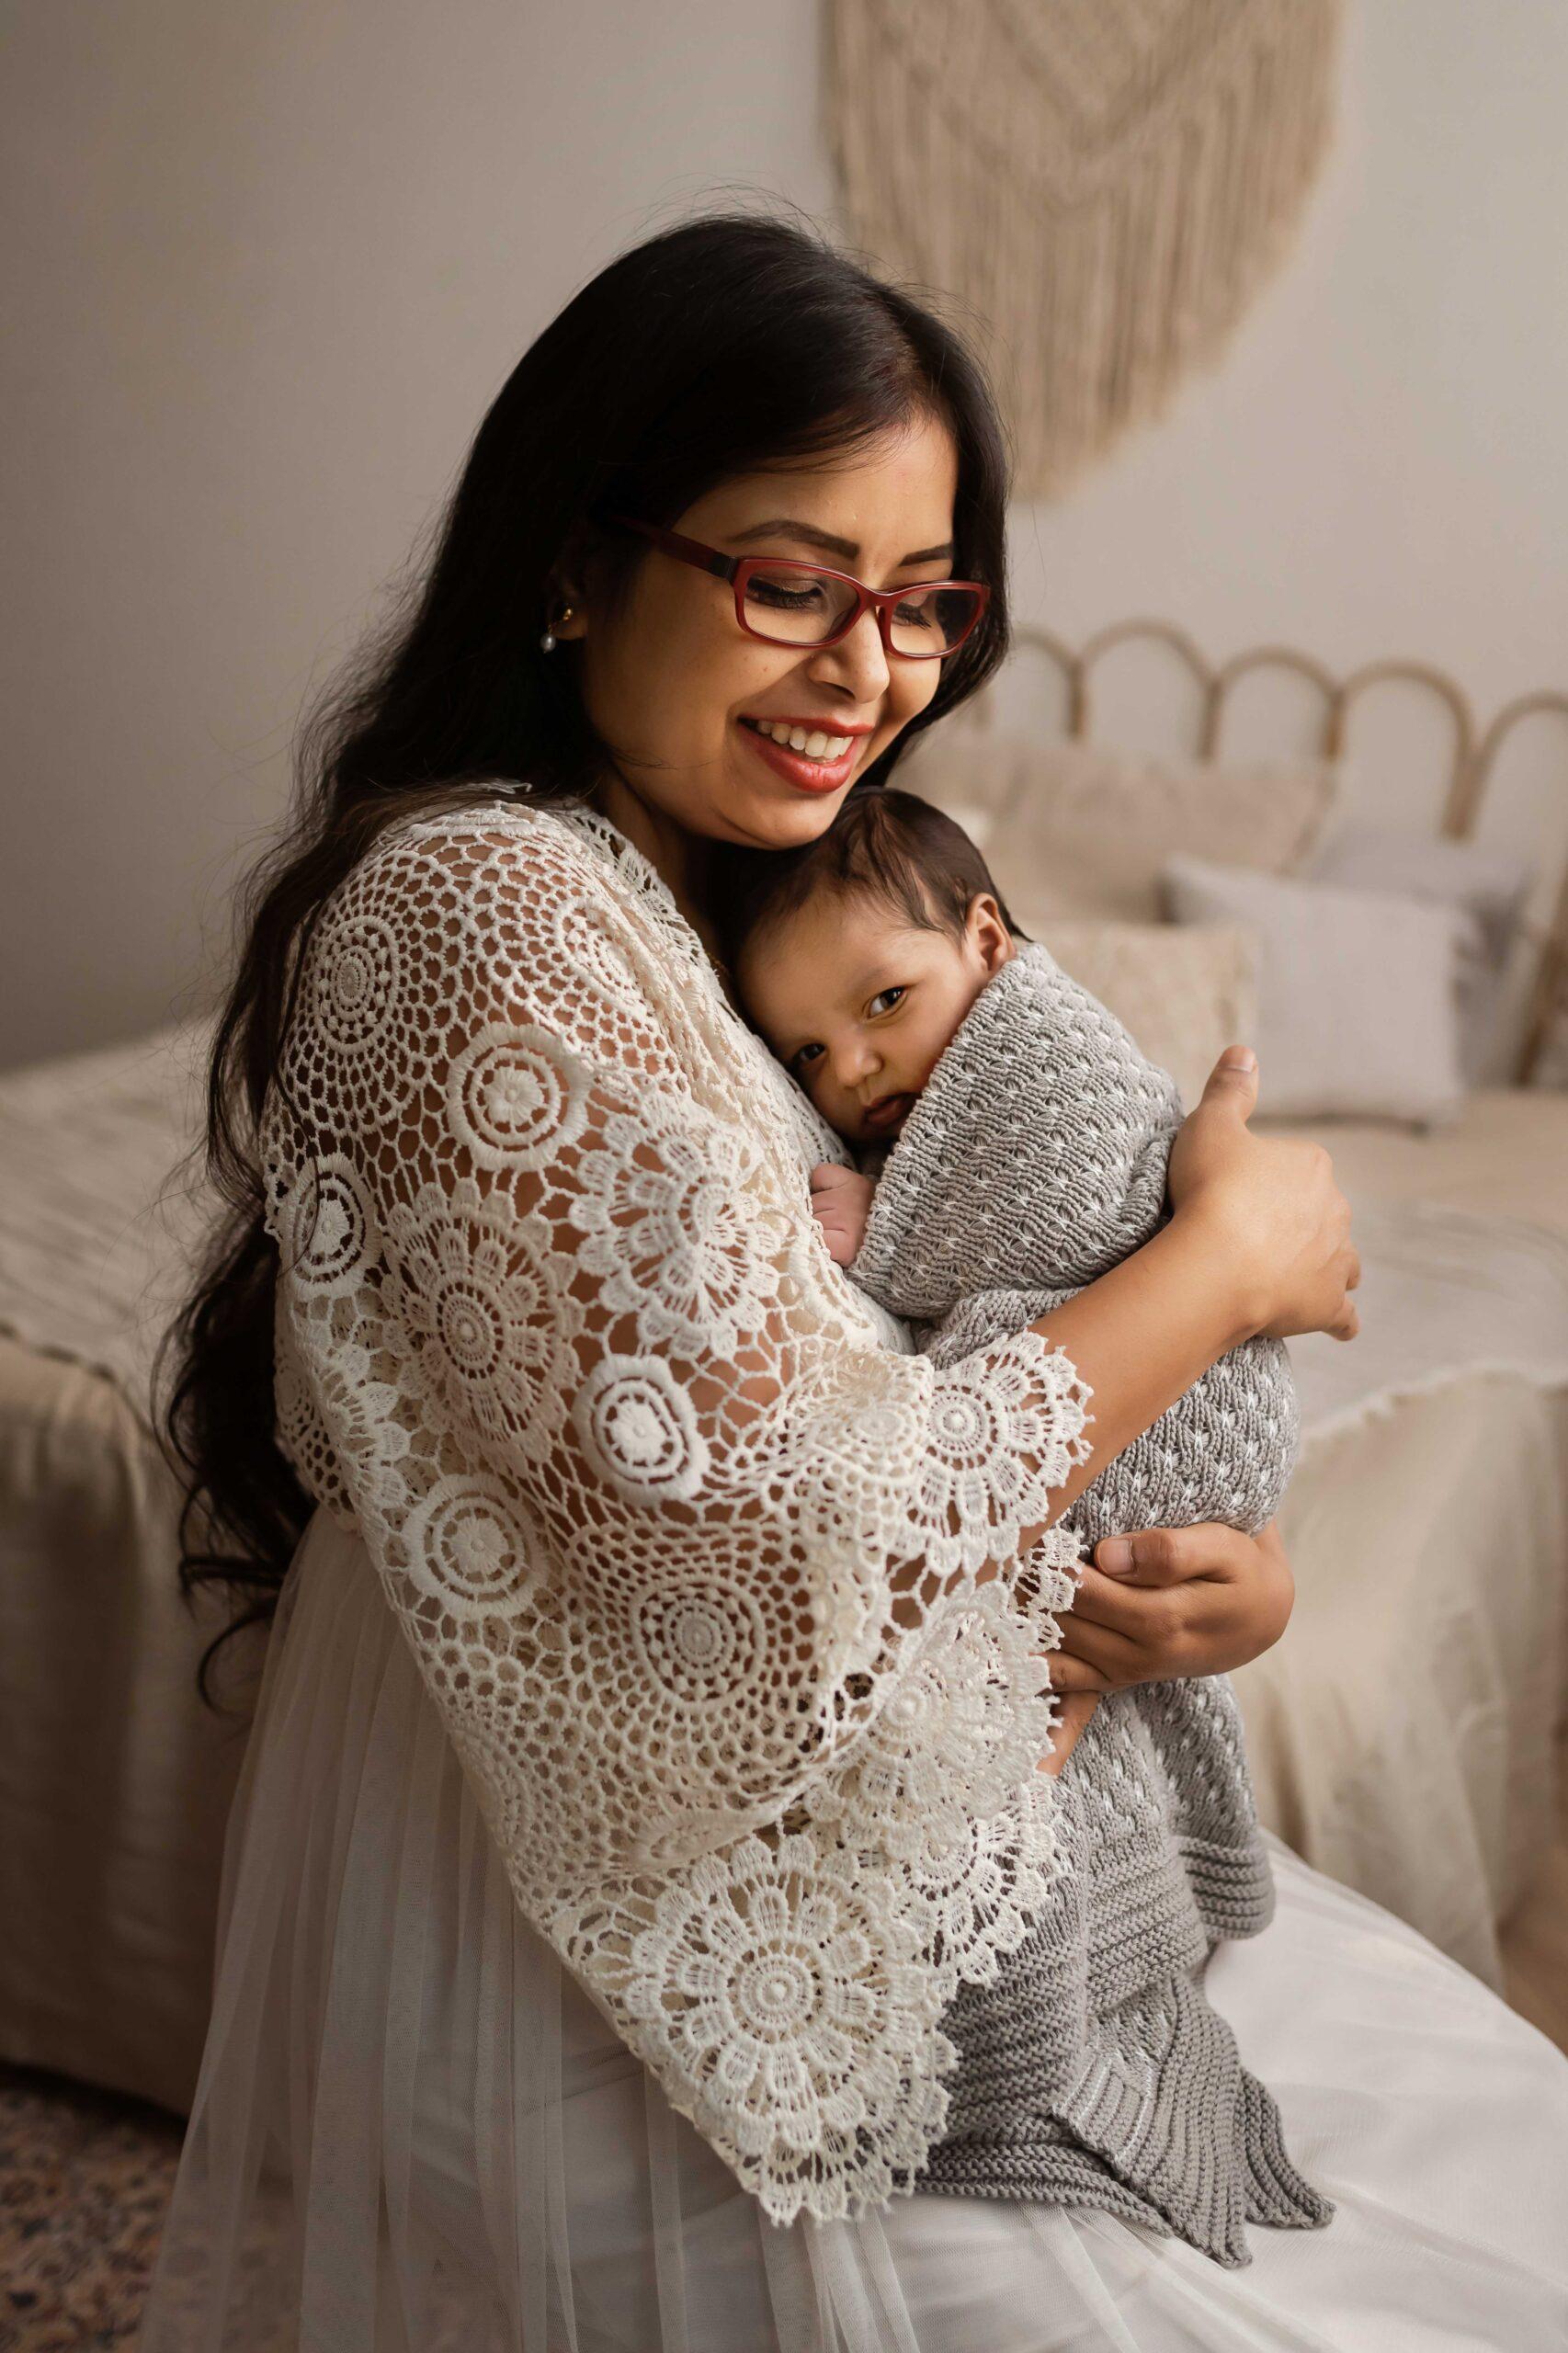 Anav newborn photographer arnhem